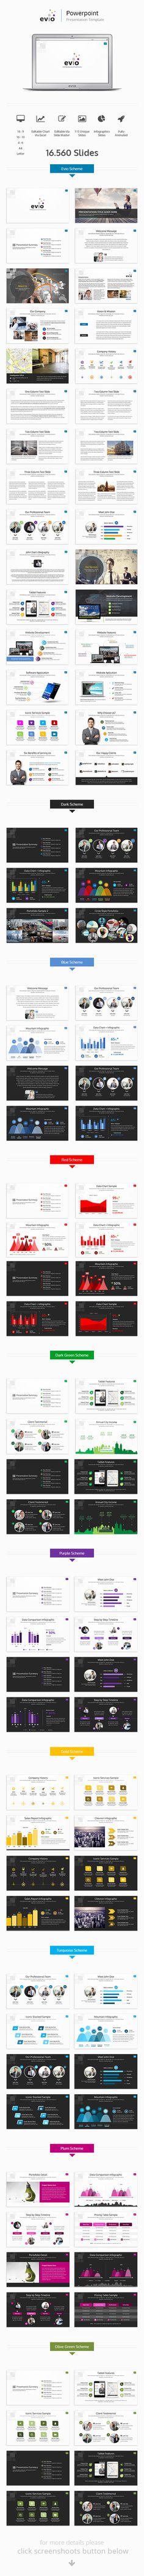 Evio Powerpoint Template (PowerPoint Templates)